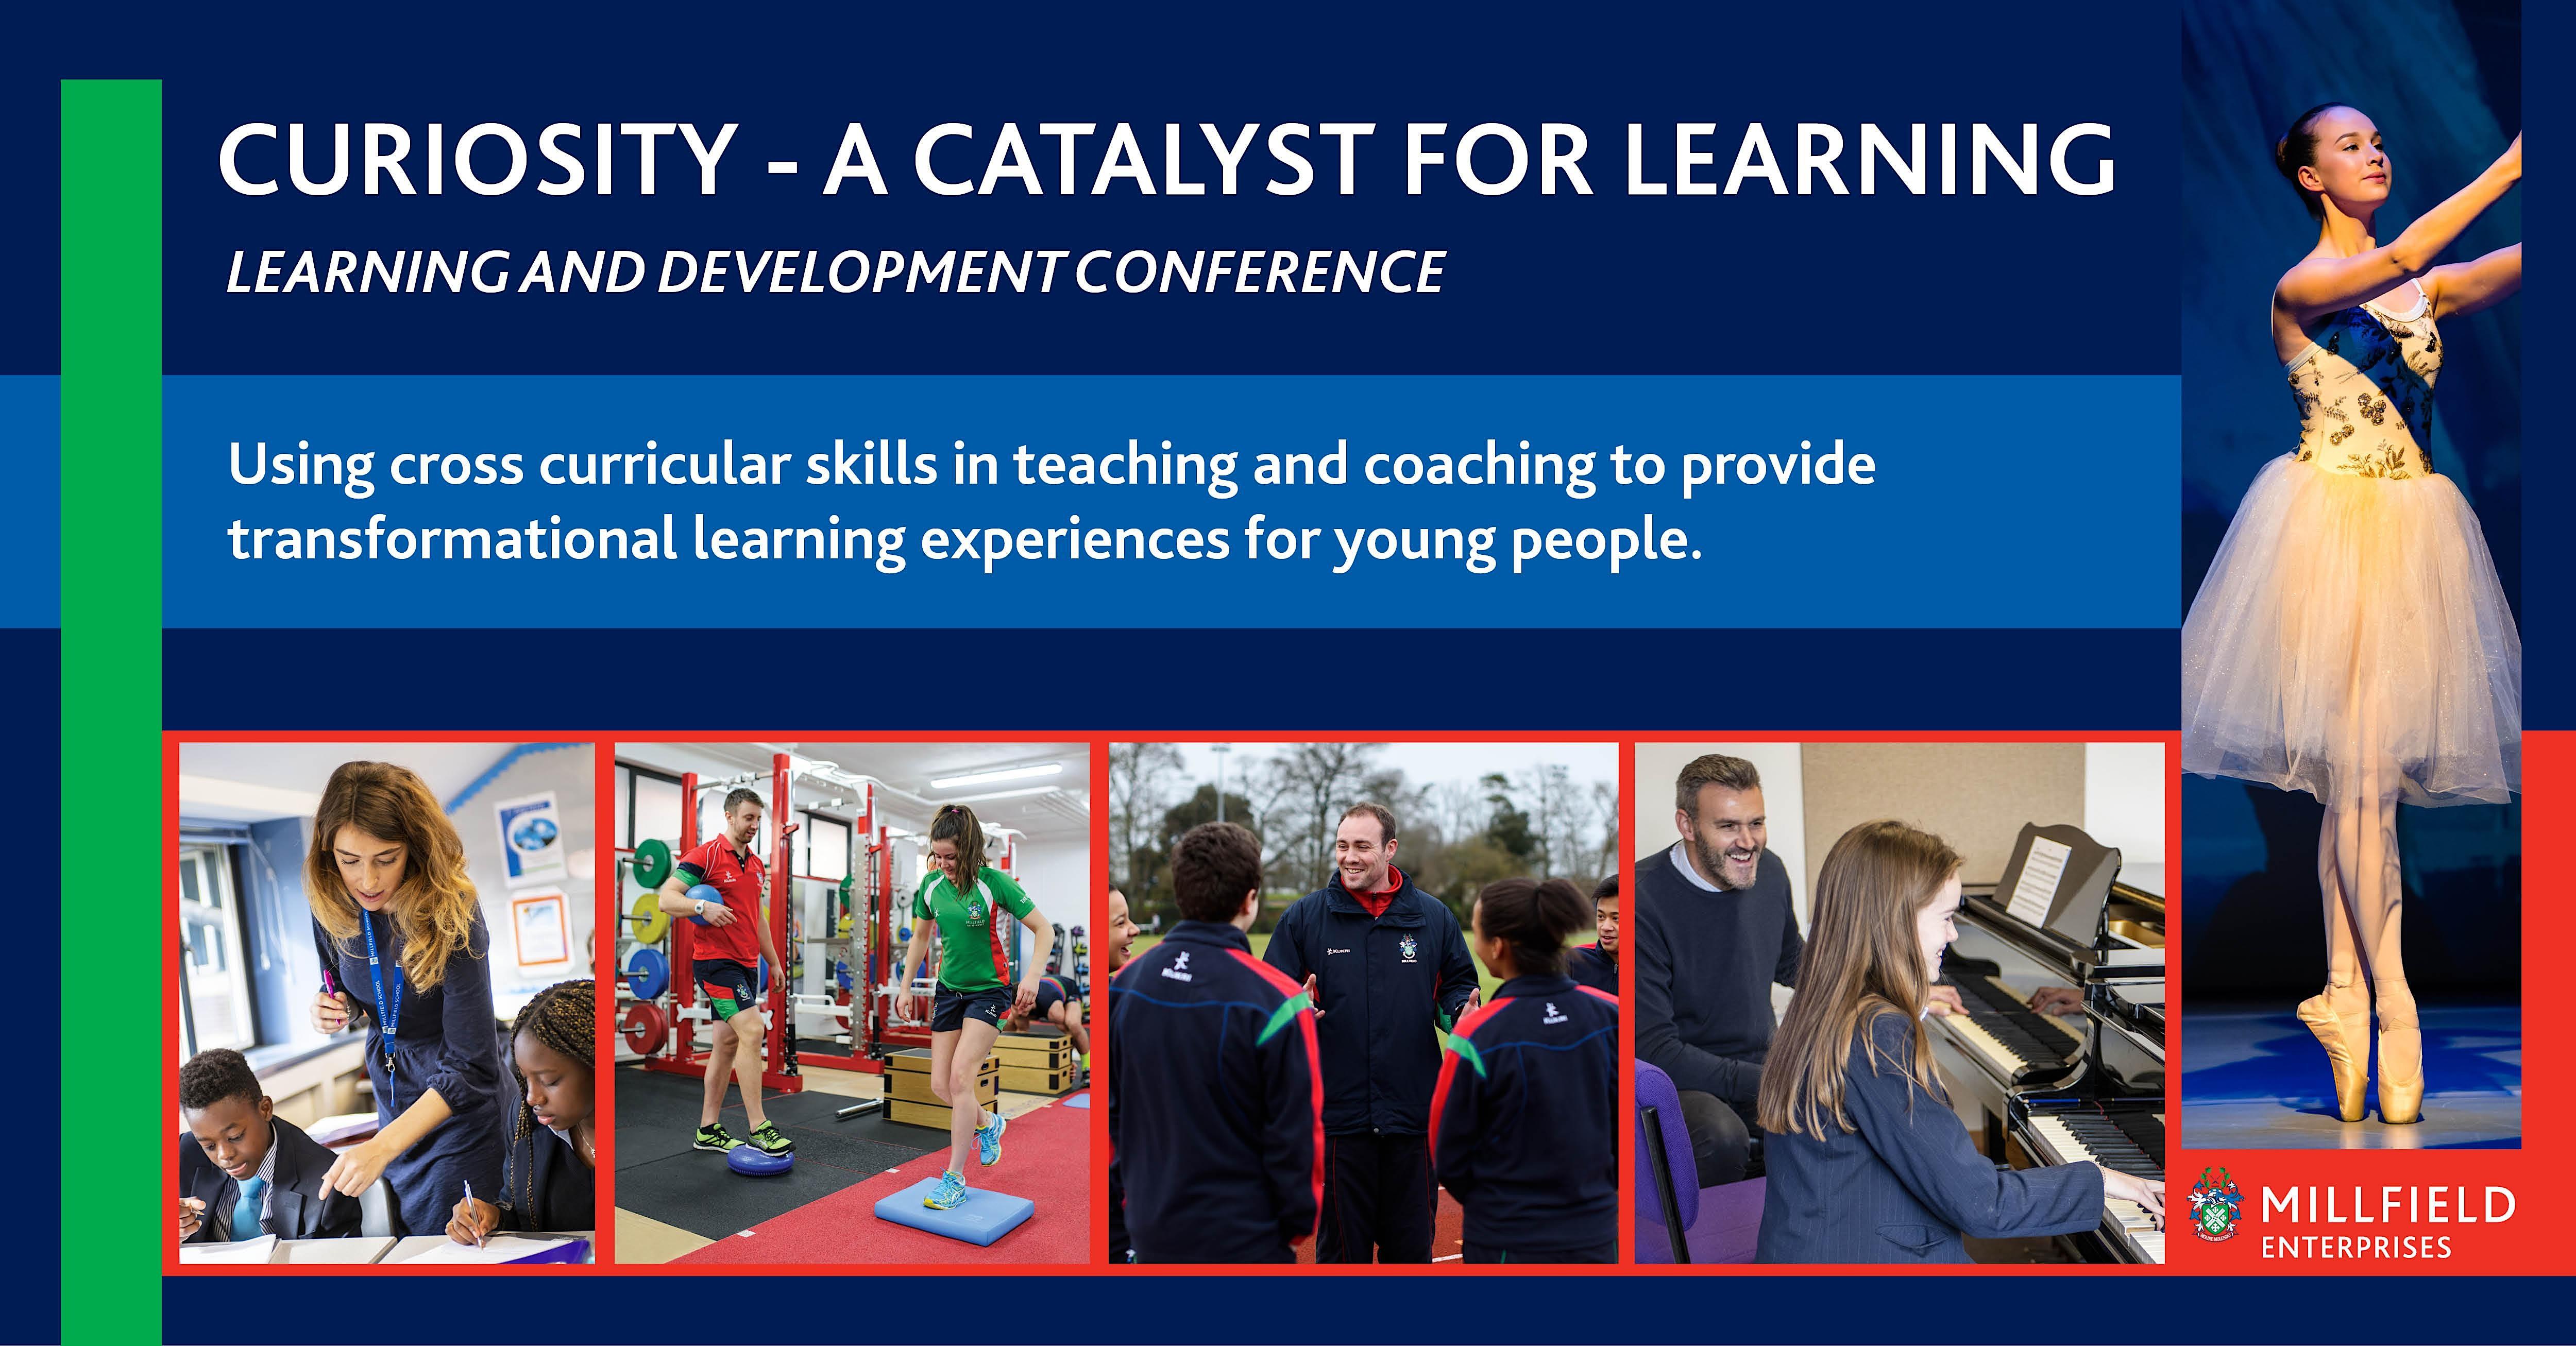 Curiosity - A Catalyst For Learning